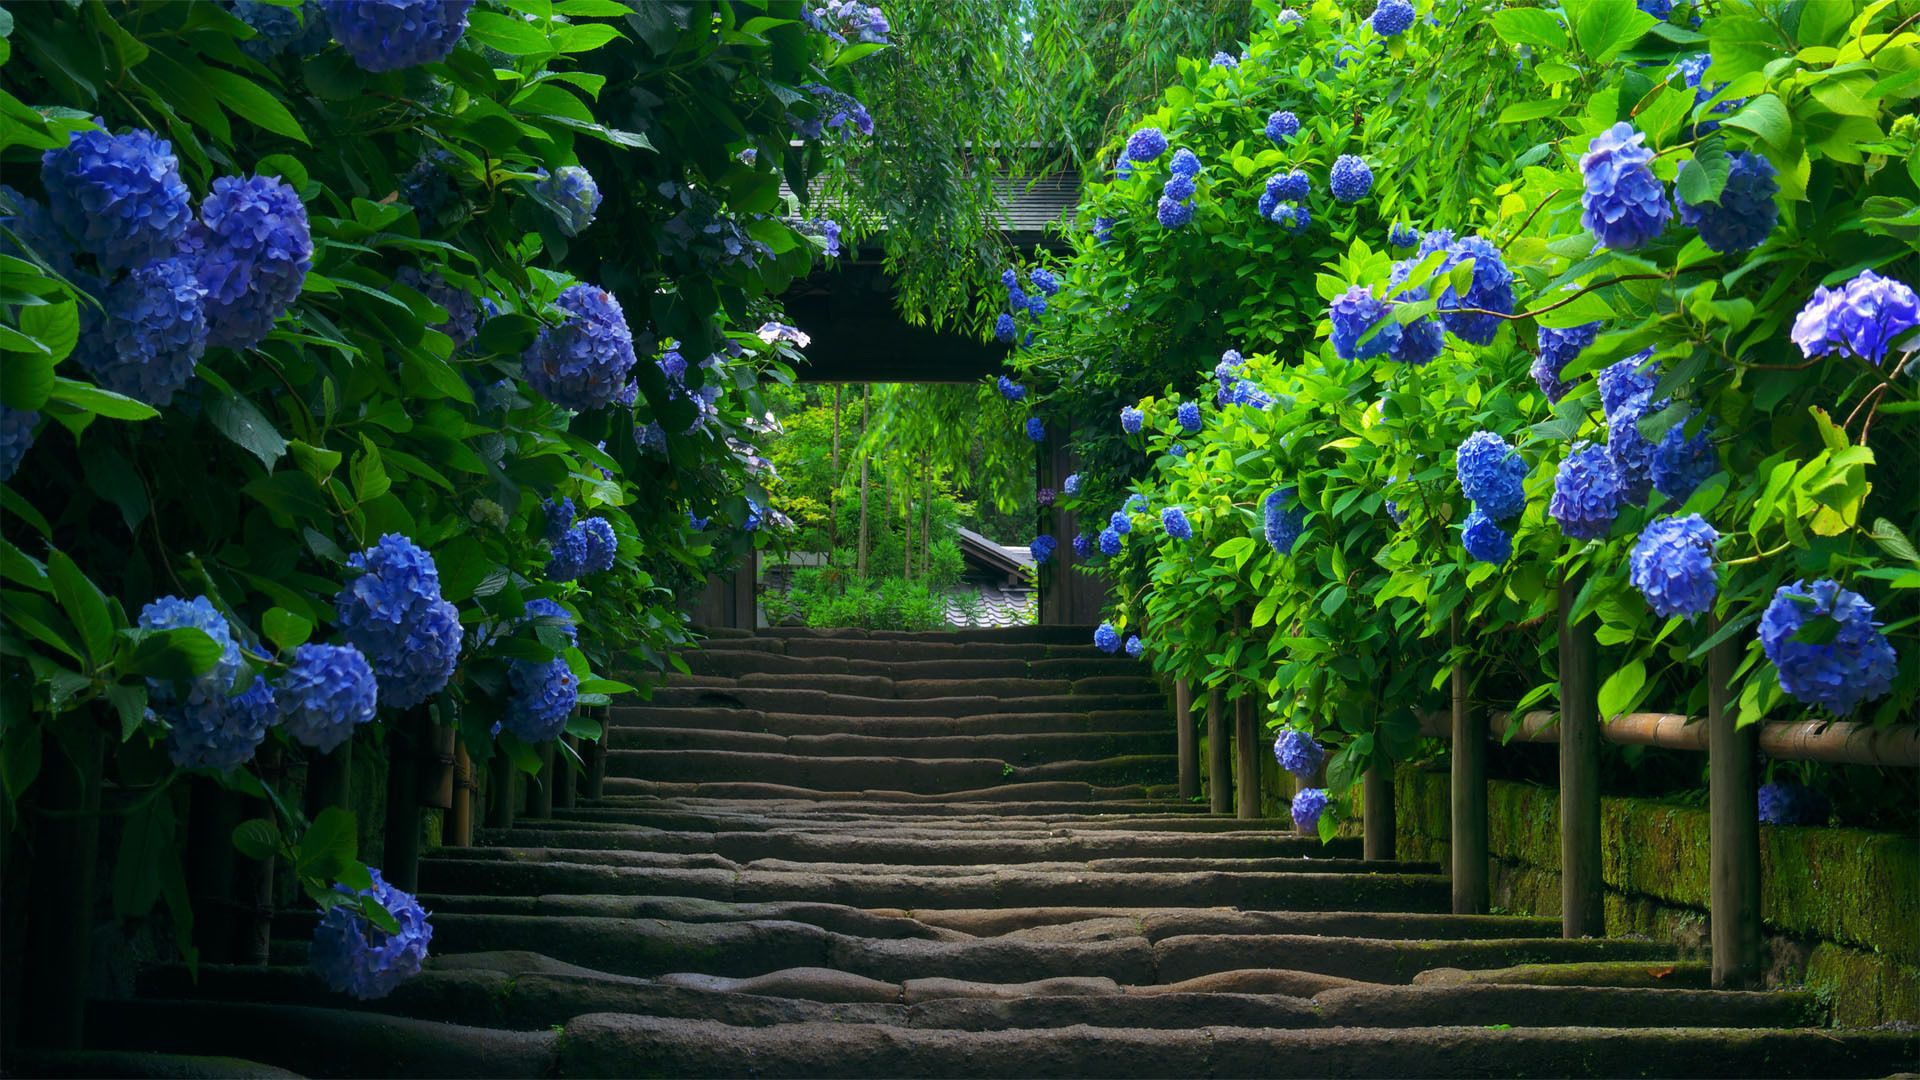 Plavo Cvijece U Vrtu Slike Prirode Hd Nature Wallpapers Flower Desktop Wallpaper Beautiful Hydrangeas